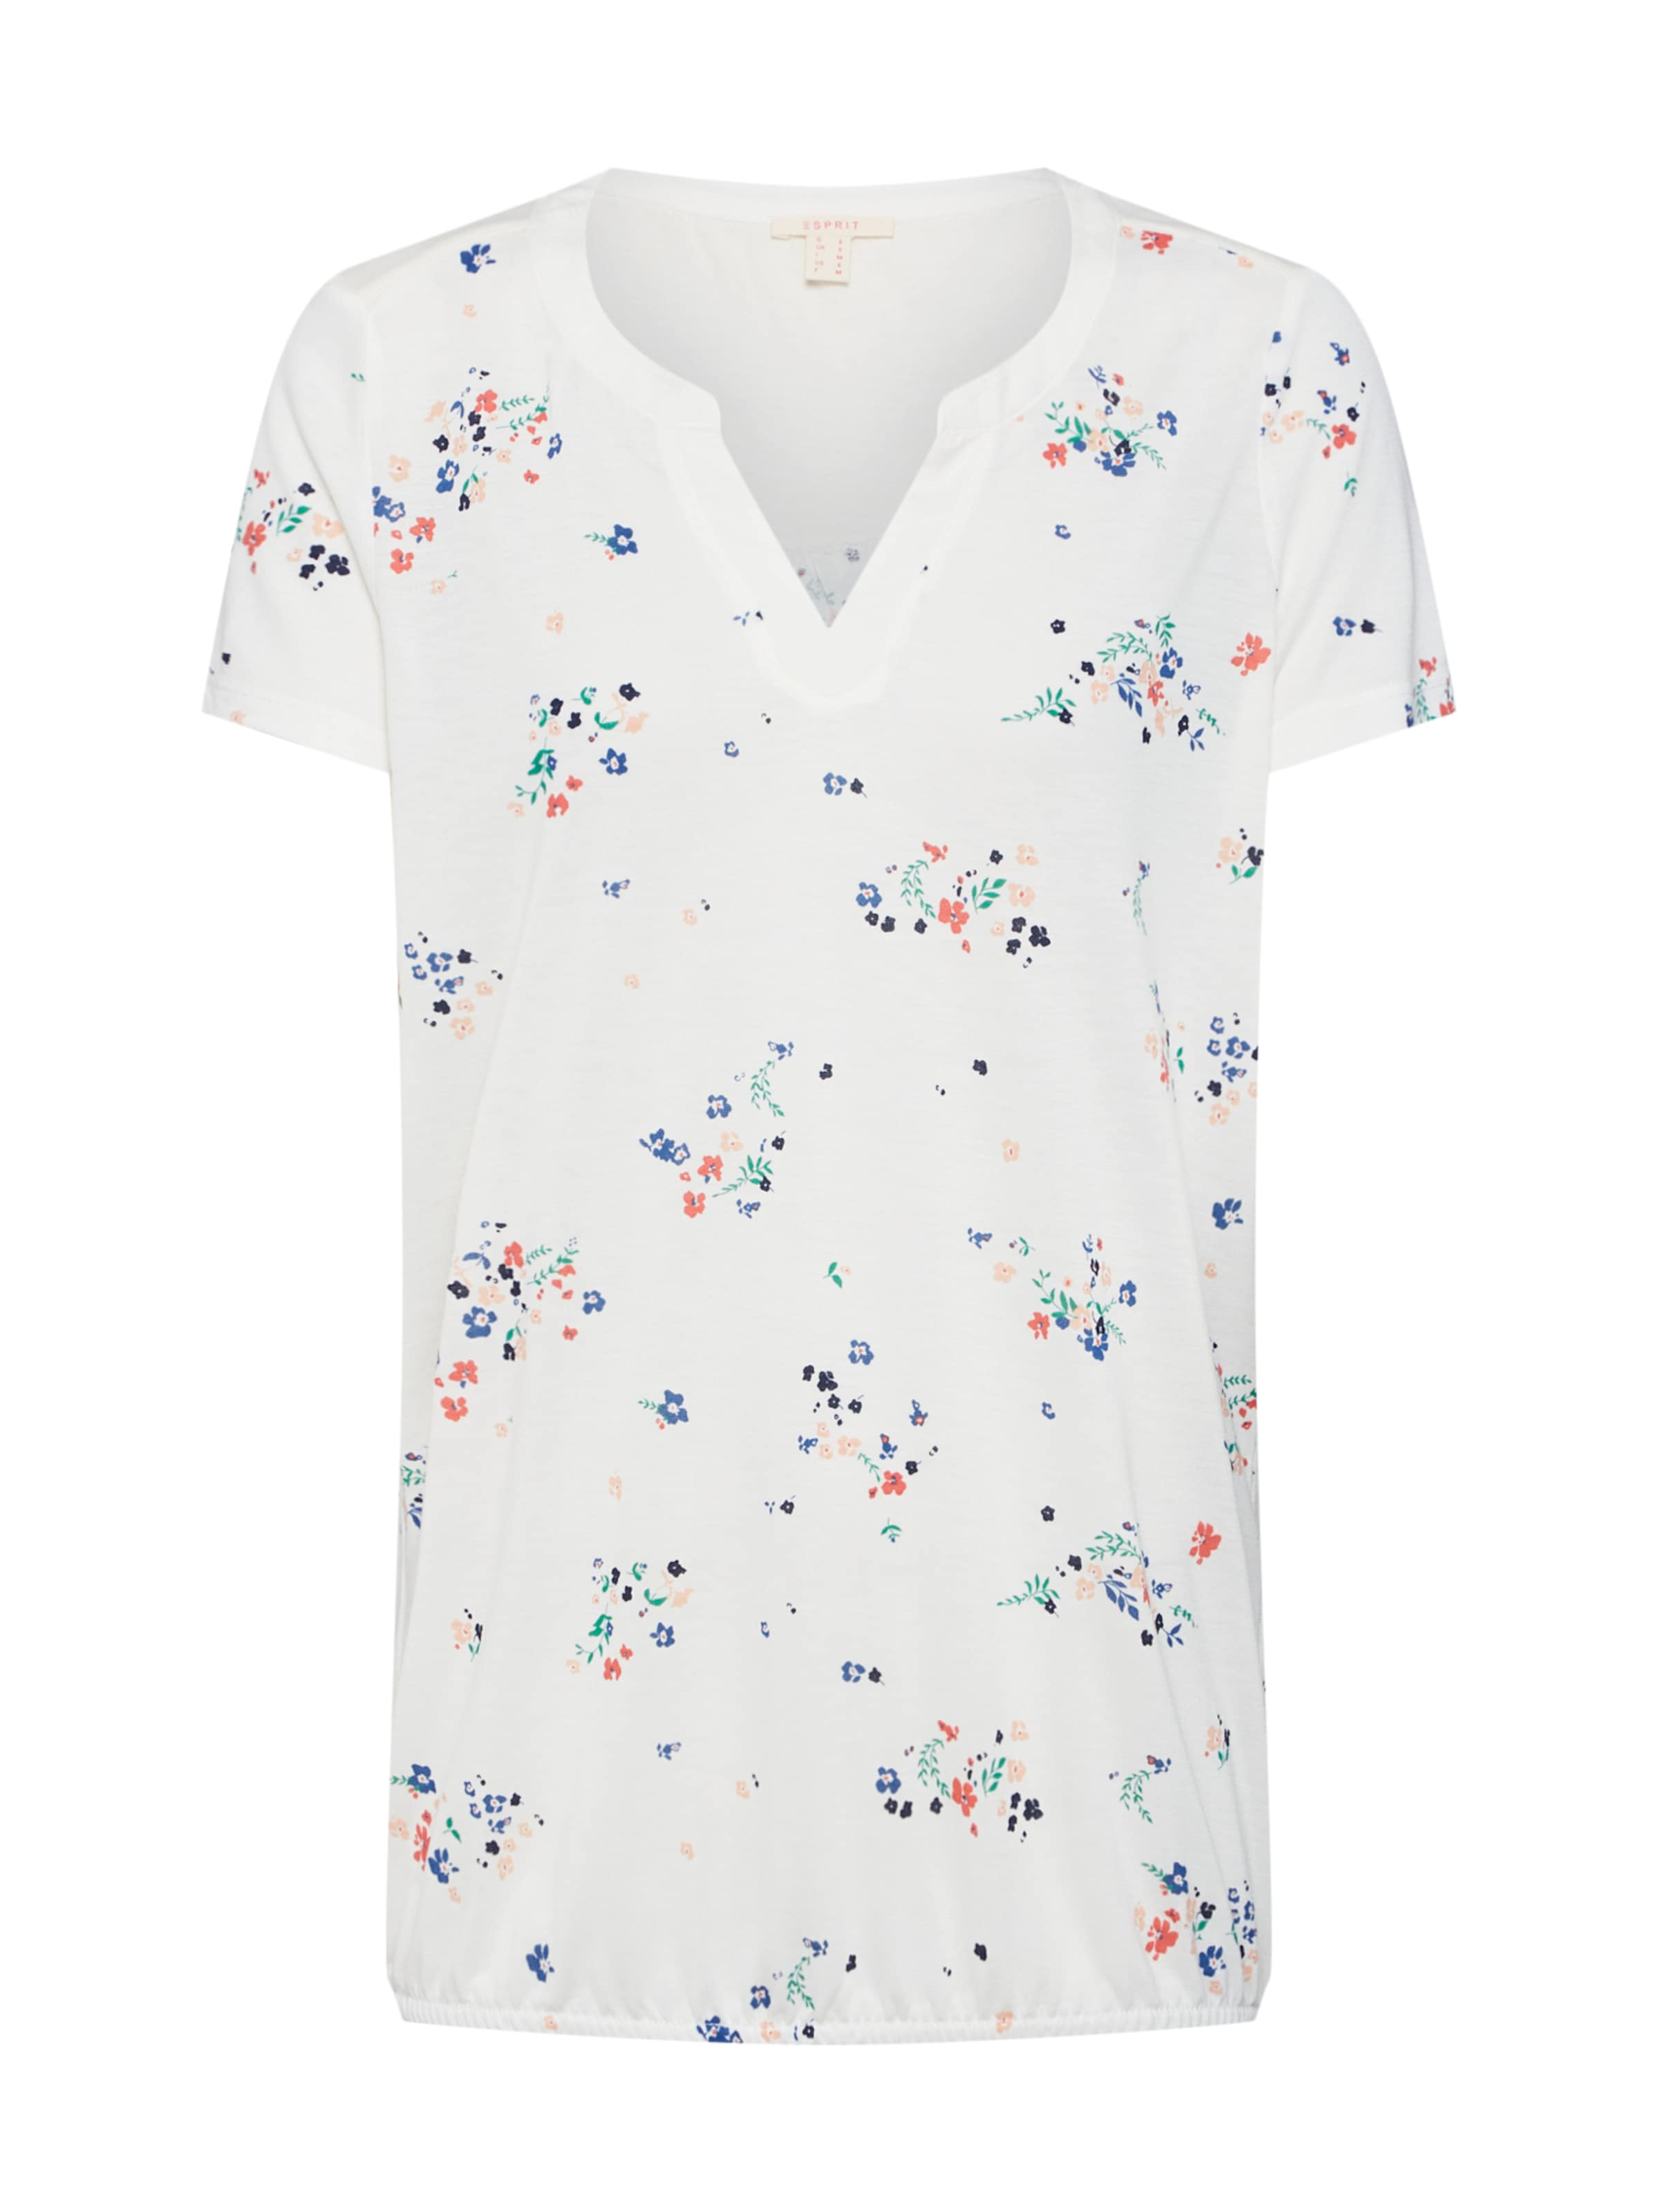 shirts' Esprit Cassé Blanc T T shirt mod Henley 'co En POiuXZkT